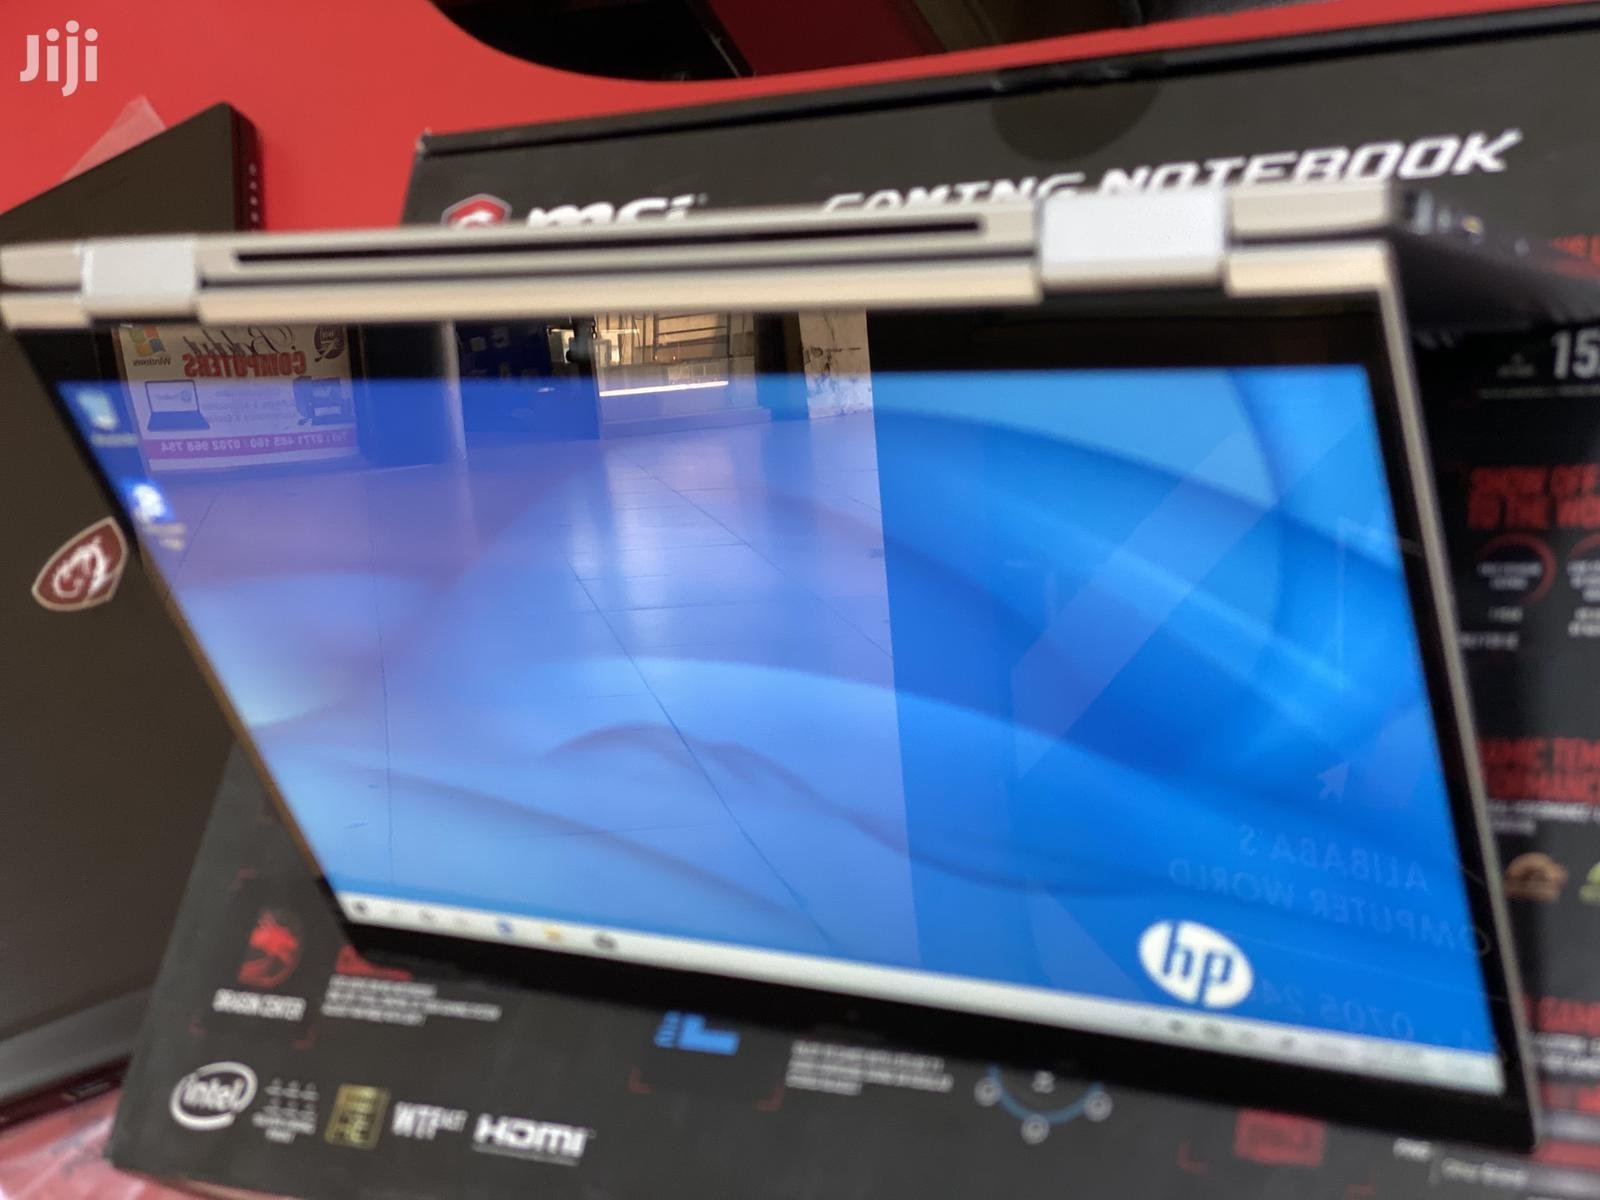 New Laptop HP EliteBook 1040 G4 16GB Intel Core i7 SSHD (Hybrid) 512GB | Laptops & Computers for sale in Kampala, Central Region, Uganda